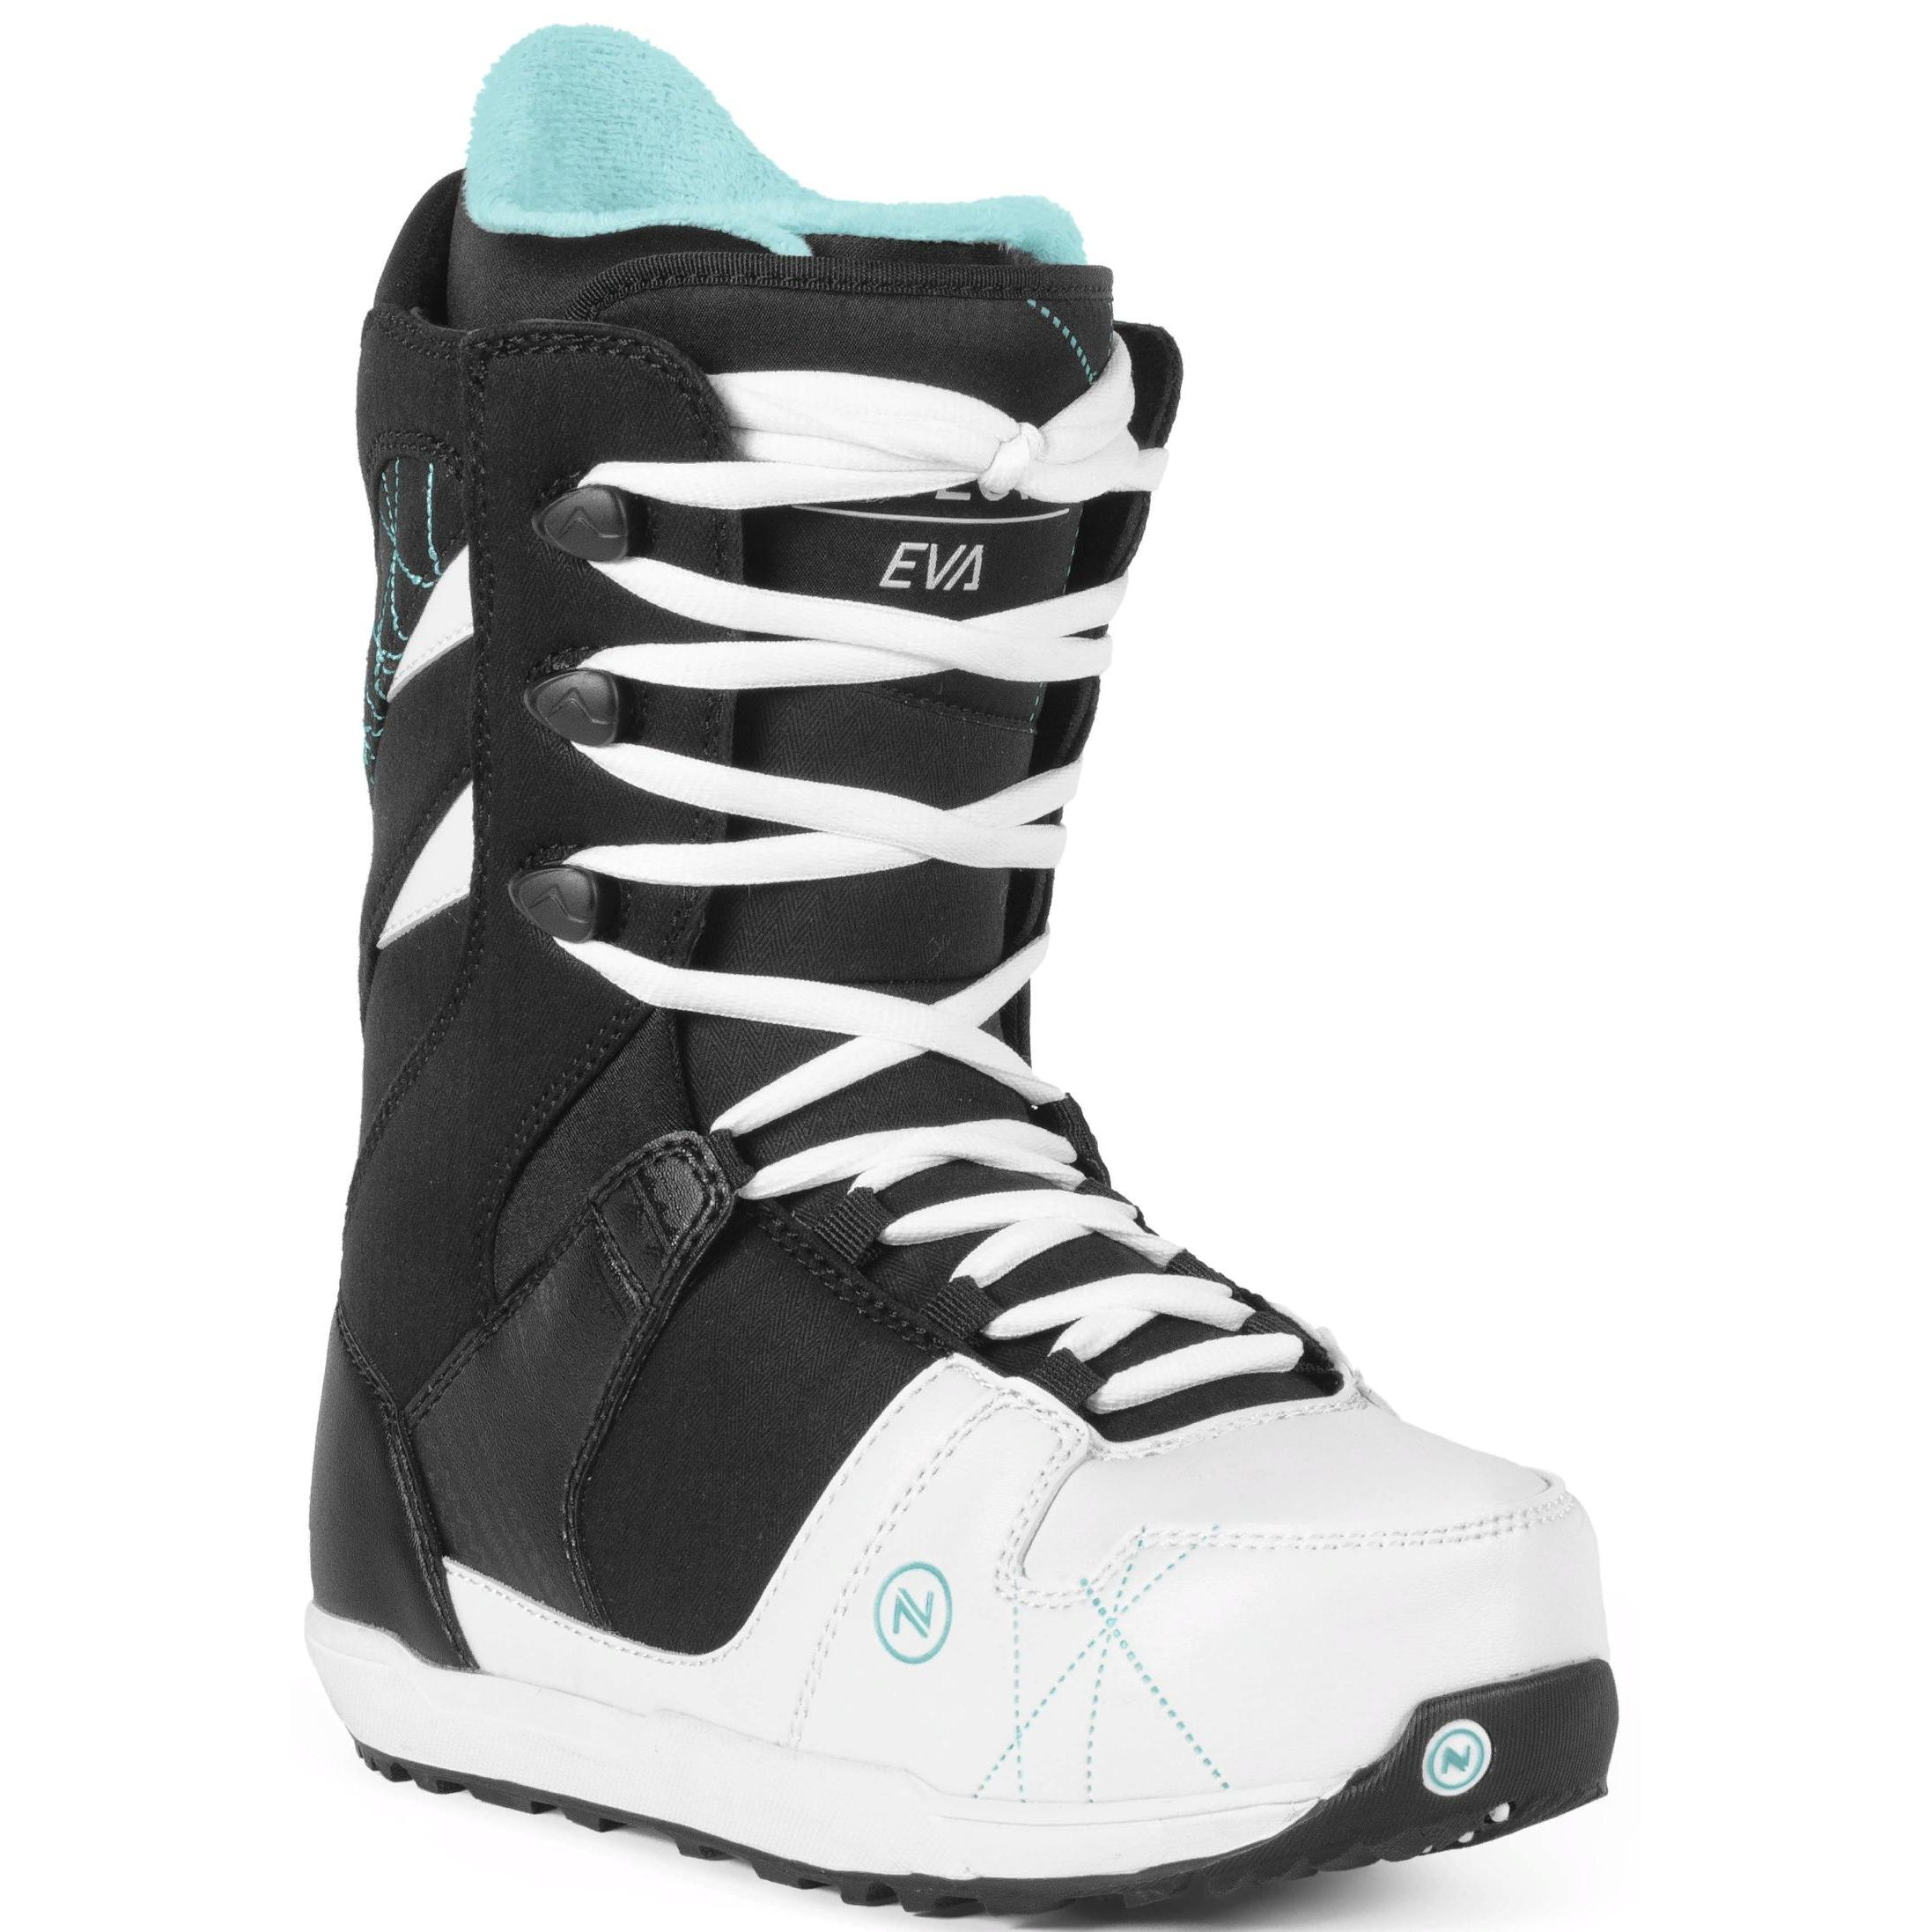 92fc54e8d400 Ботинки для сноуборда NIDECKER 2017-18 EVA LACE BLACK - купить ...